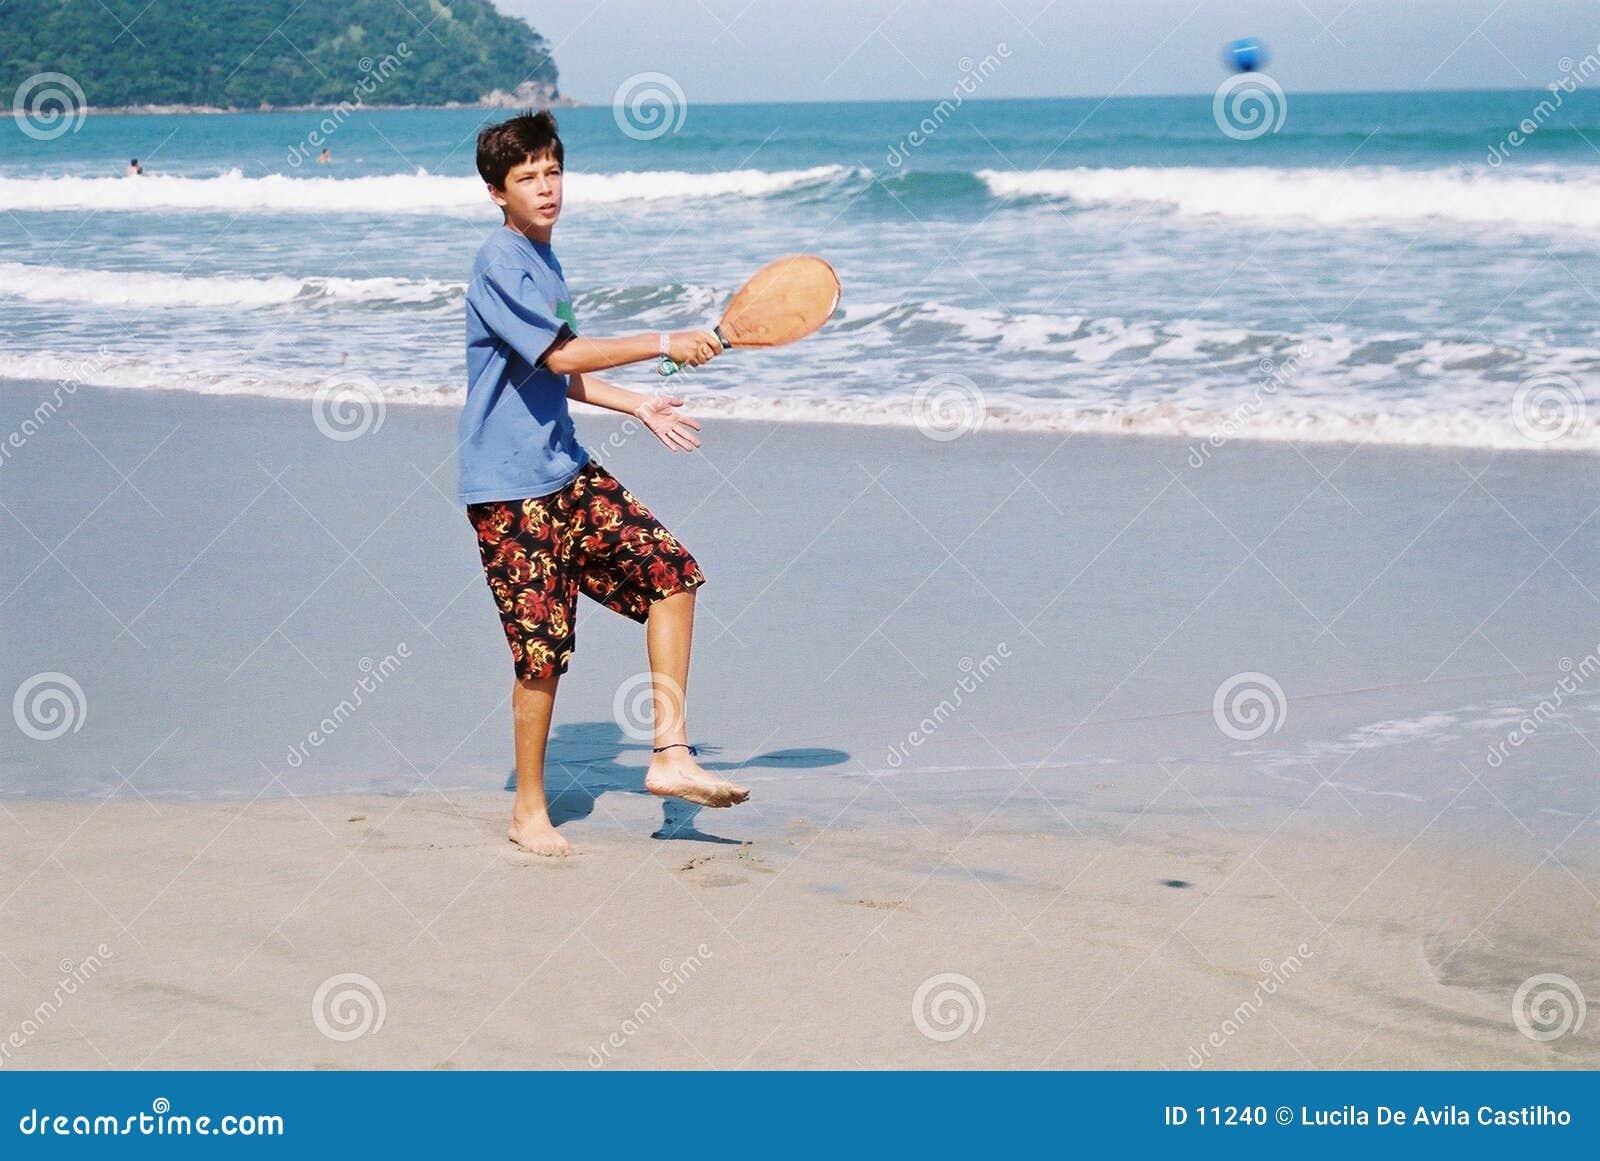 Golpee la bola